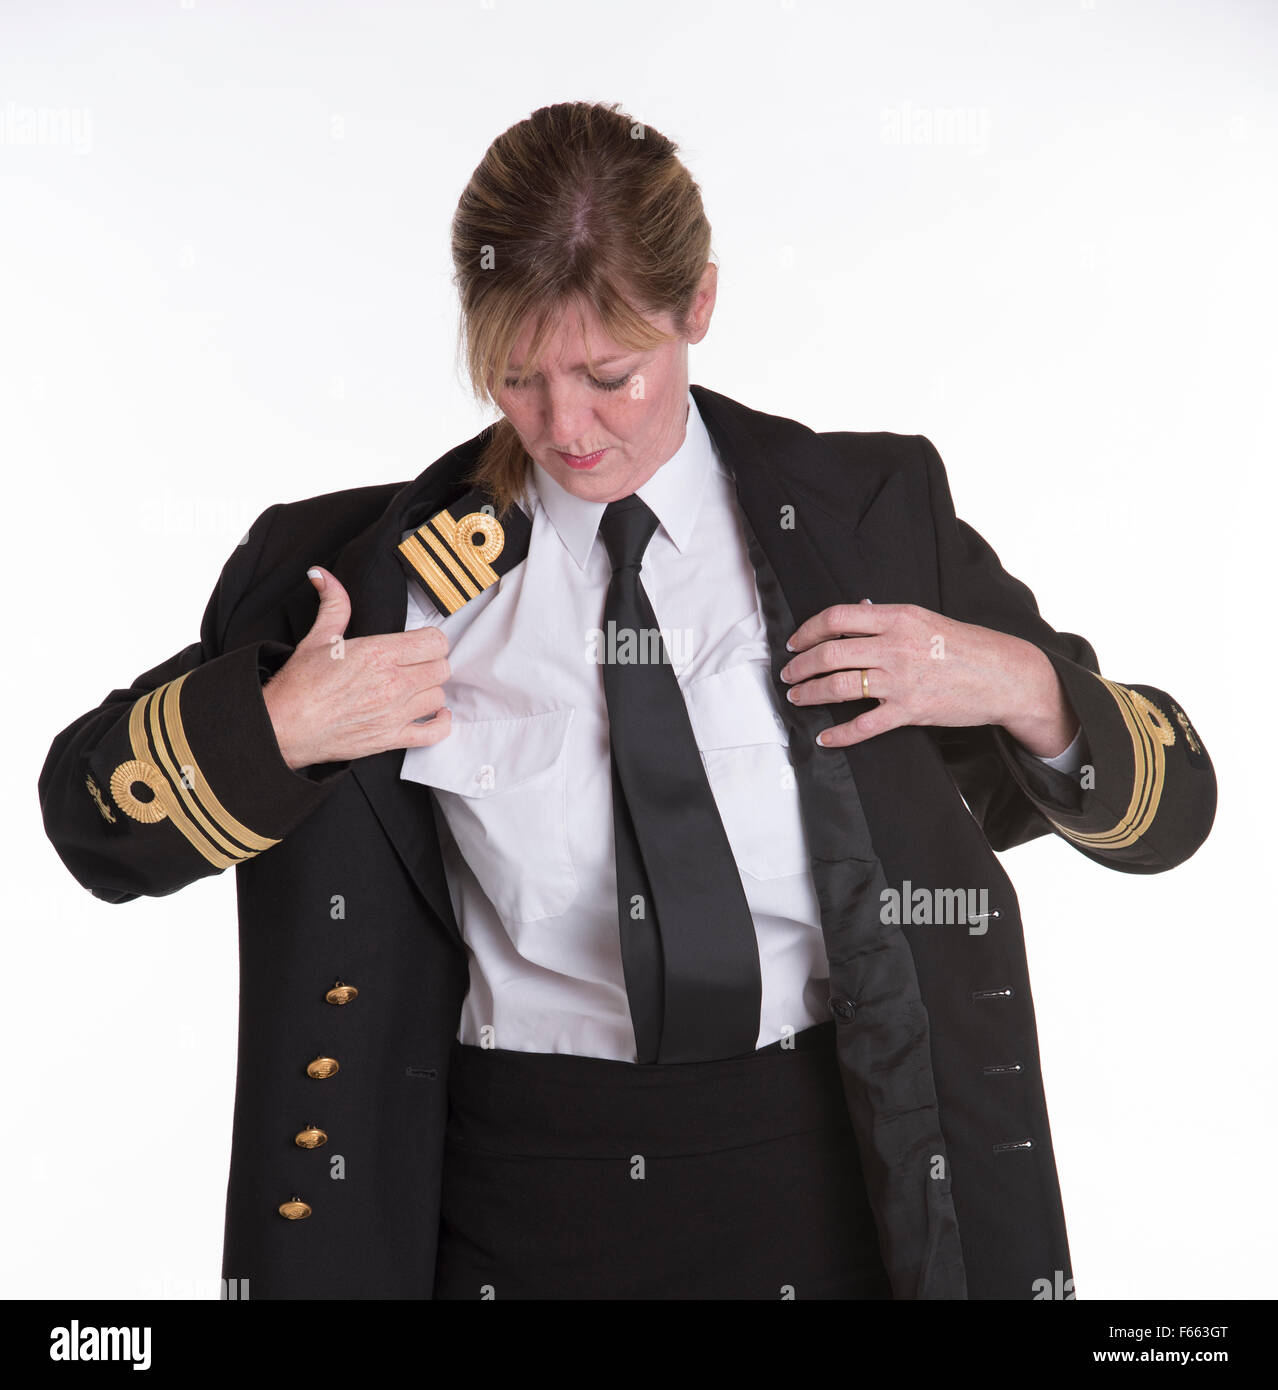 Lt Commander female South African naval officer getting dressed into uniform jacket - Stock Image